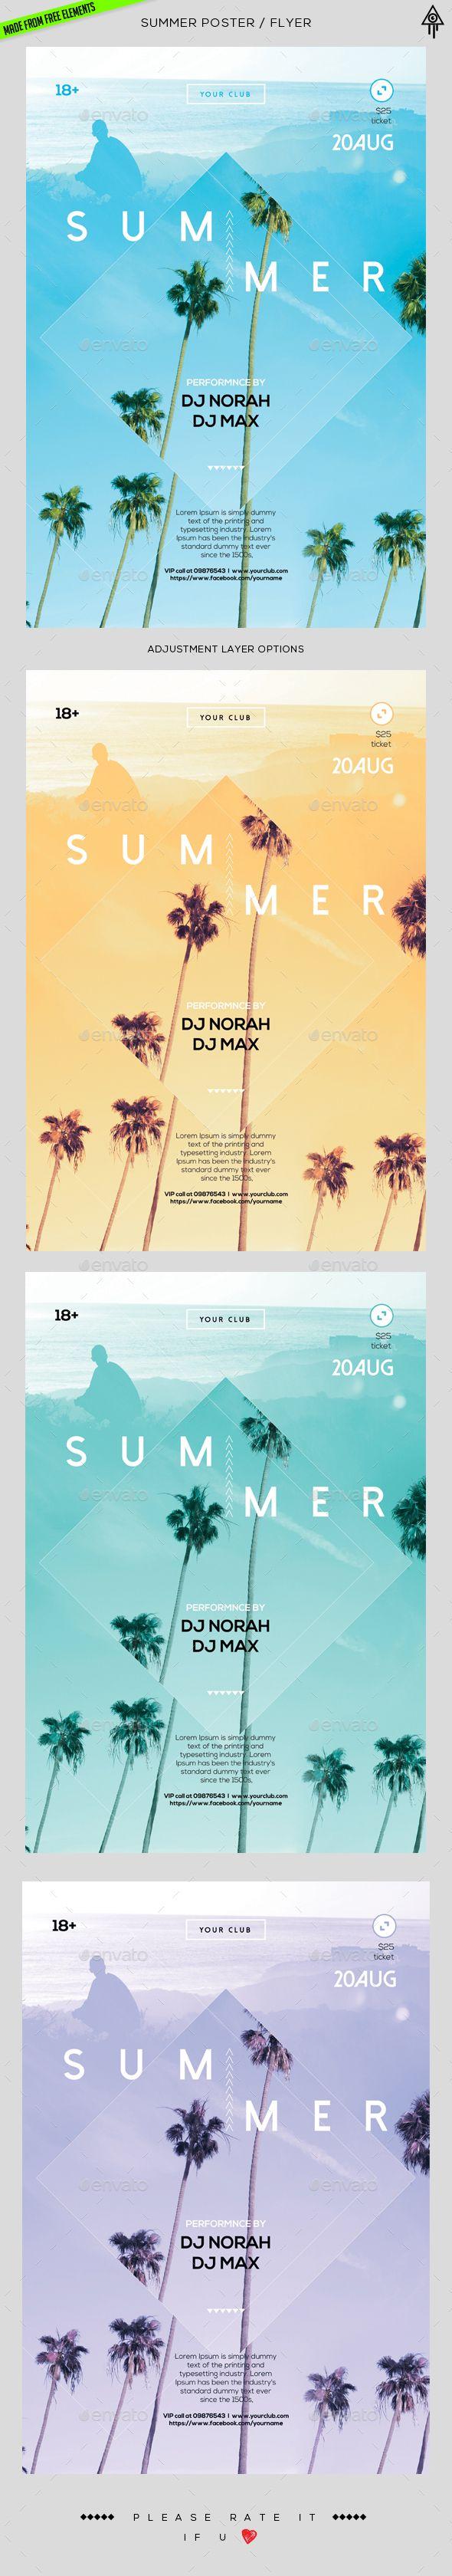 Summer Poster / Flyer Template PSD. Download here: http://graphicriver.net/item/summer-poster-flyer/16669722?ref=ksioks